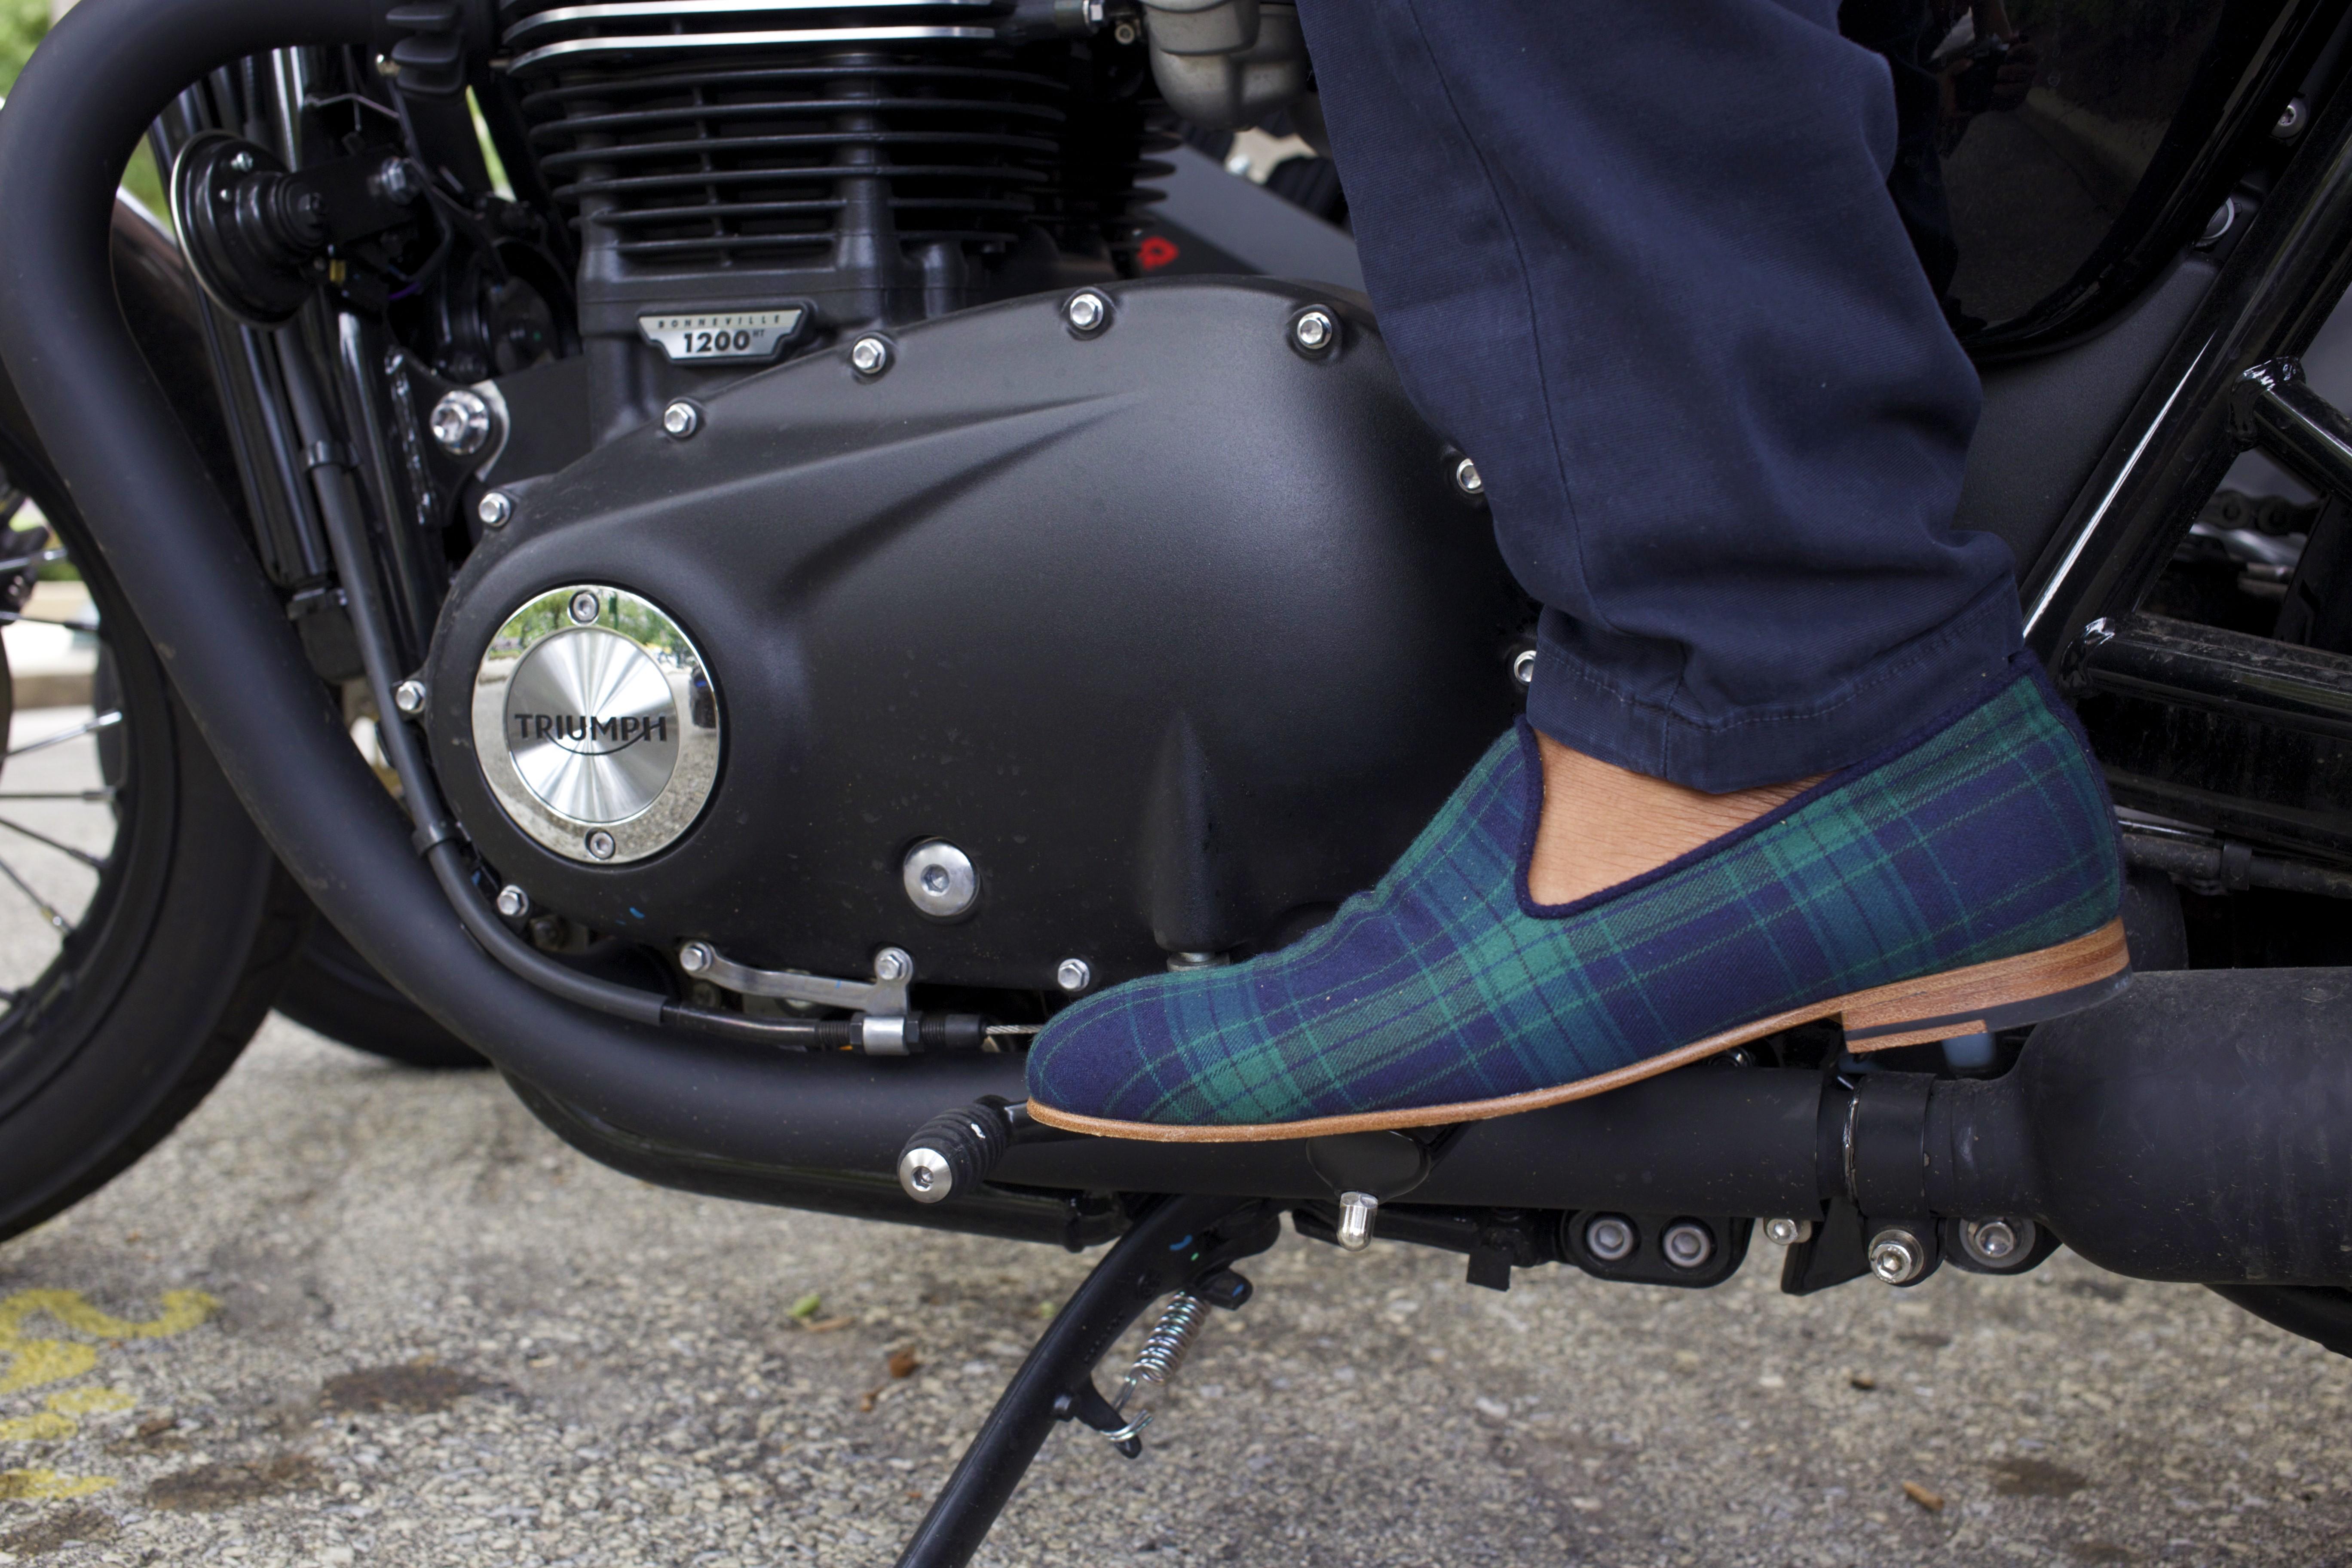 Sabir M. Peele of Men's Style Pro wearing The Napa Slipper close up moto